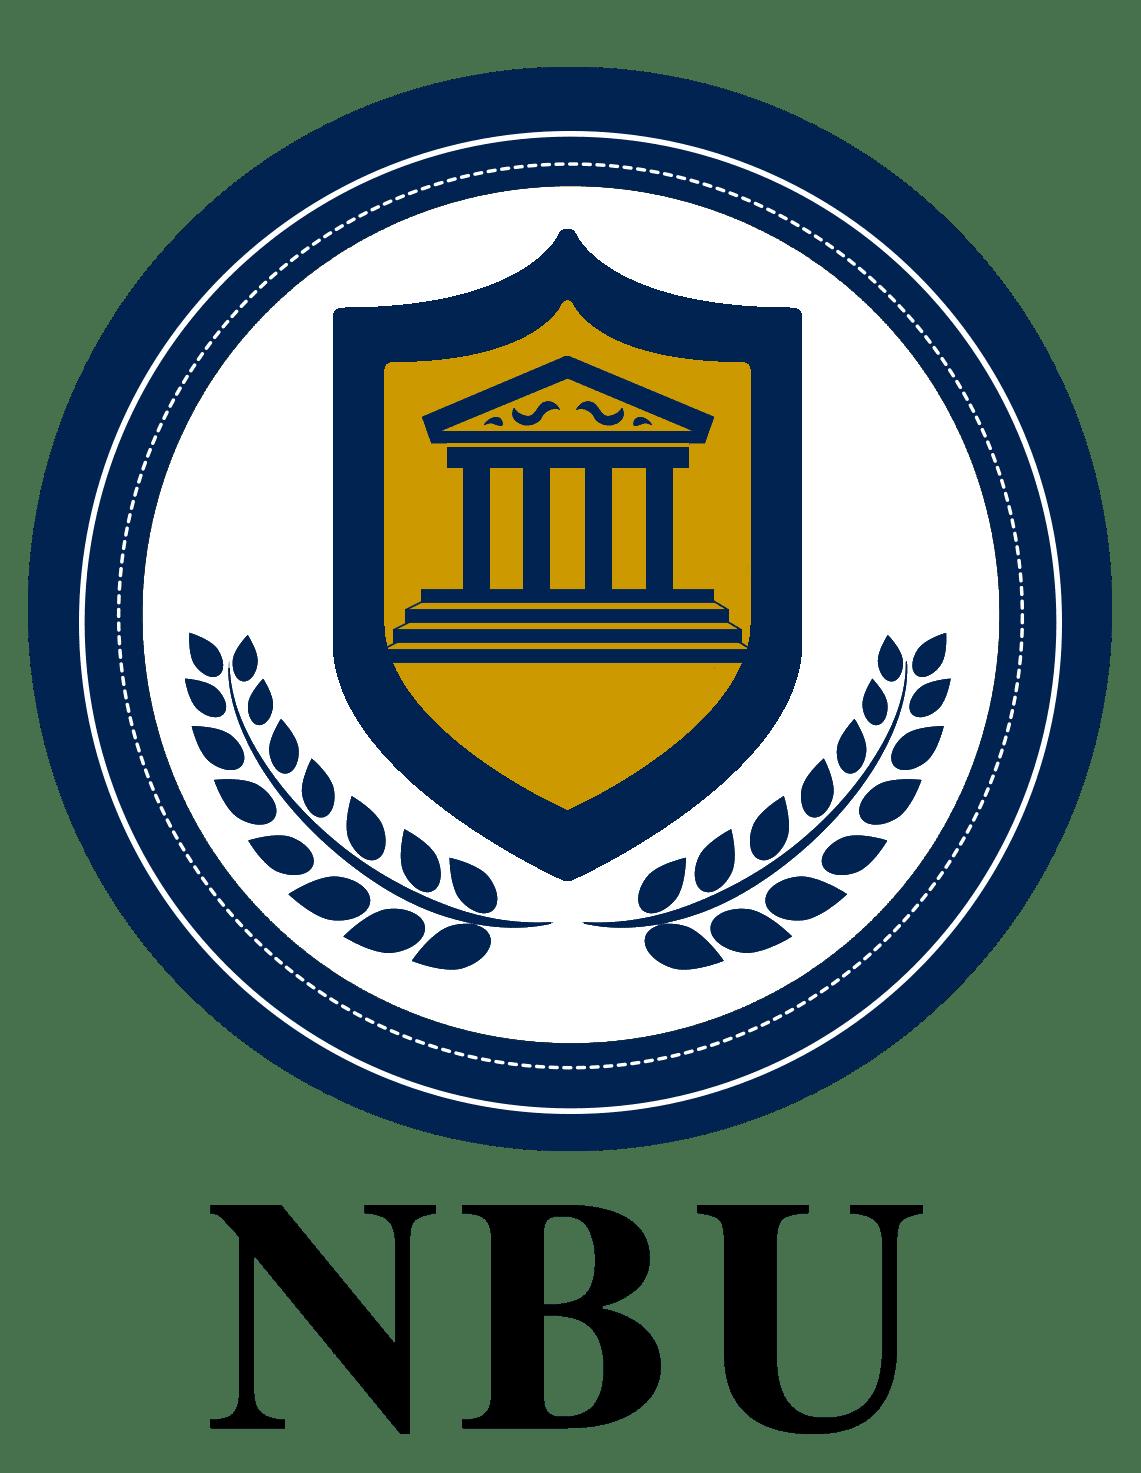 NBU_logo_full